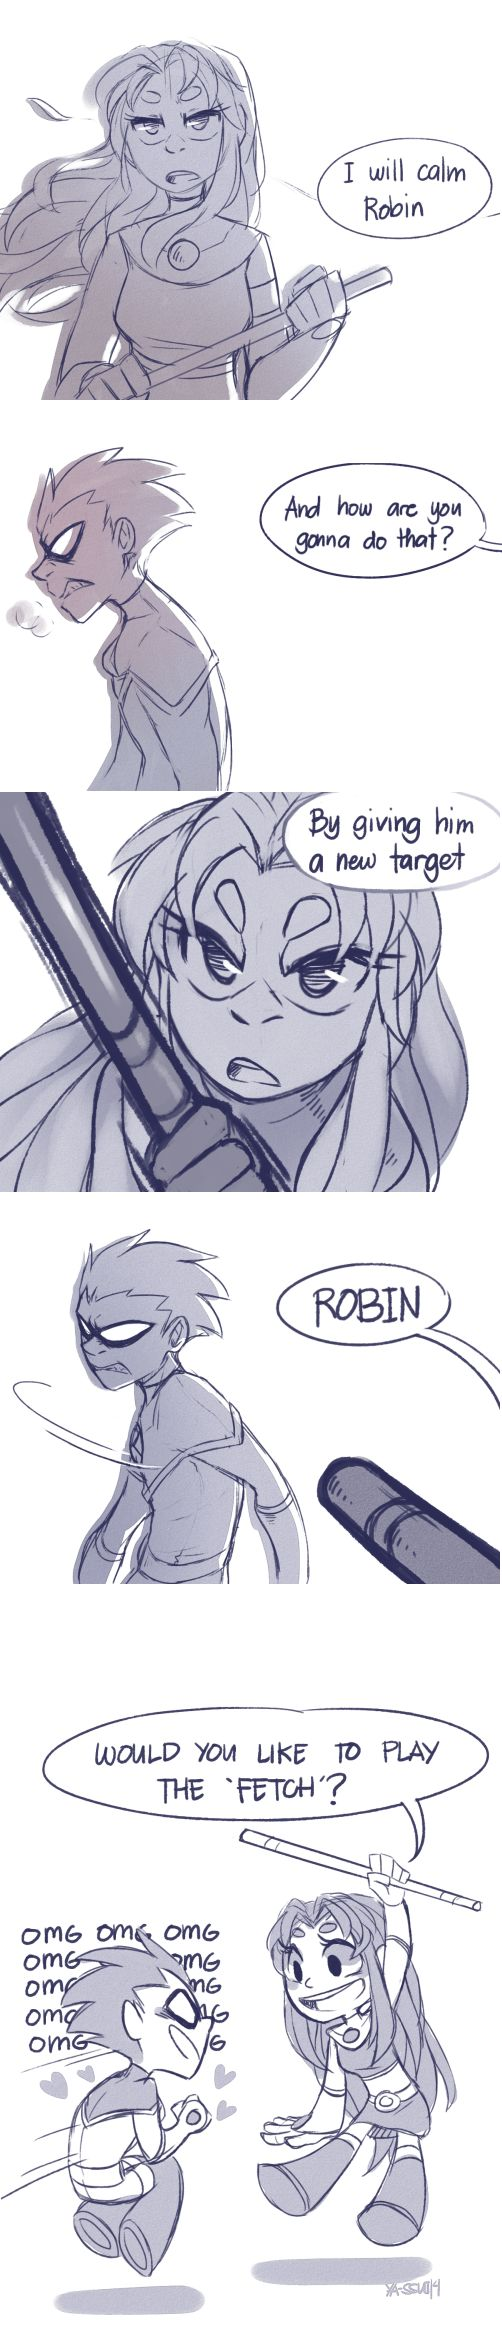 tags: teen titans, robstar, robin, starfire, tamaranean robin, starbolt five